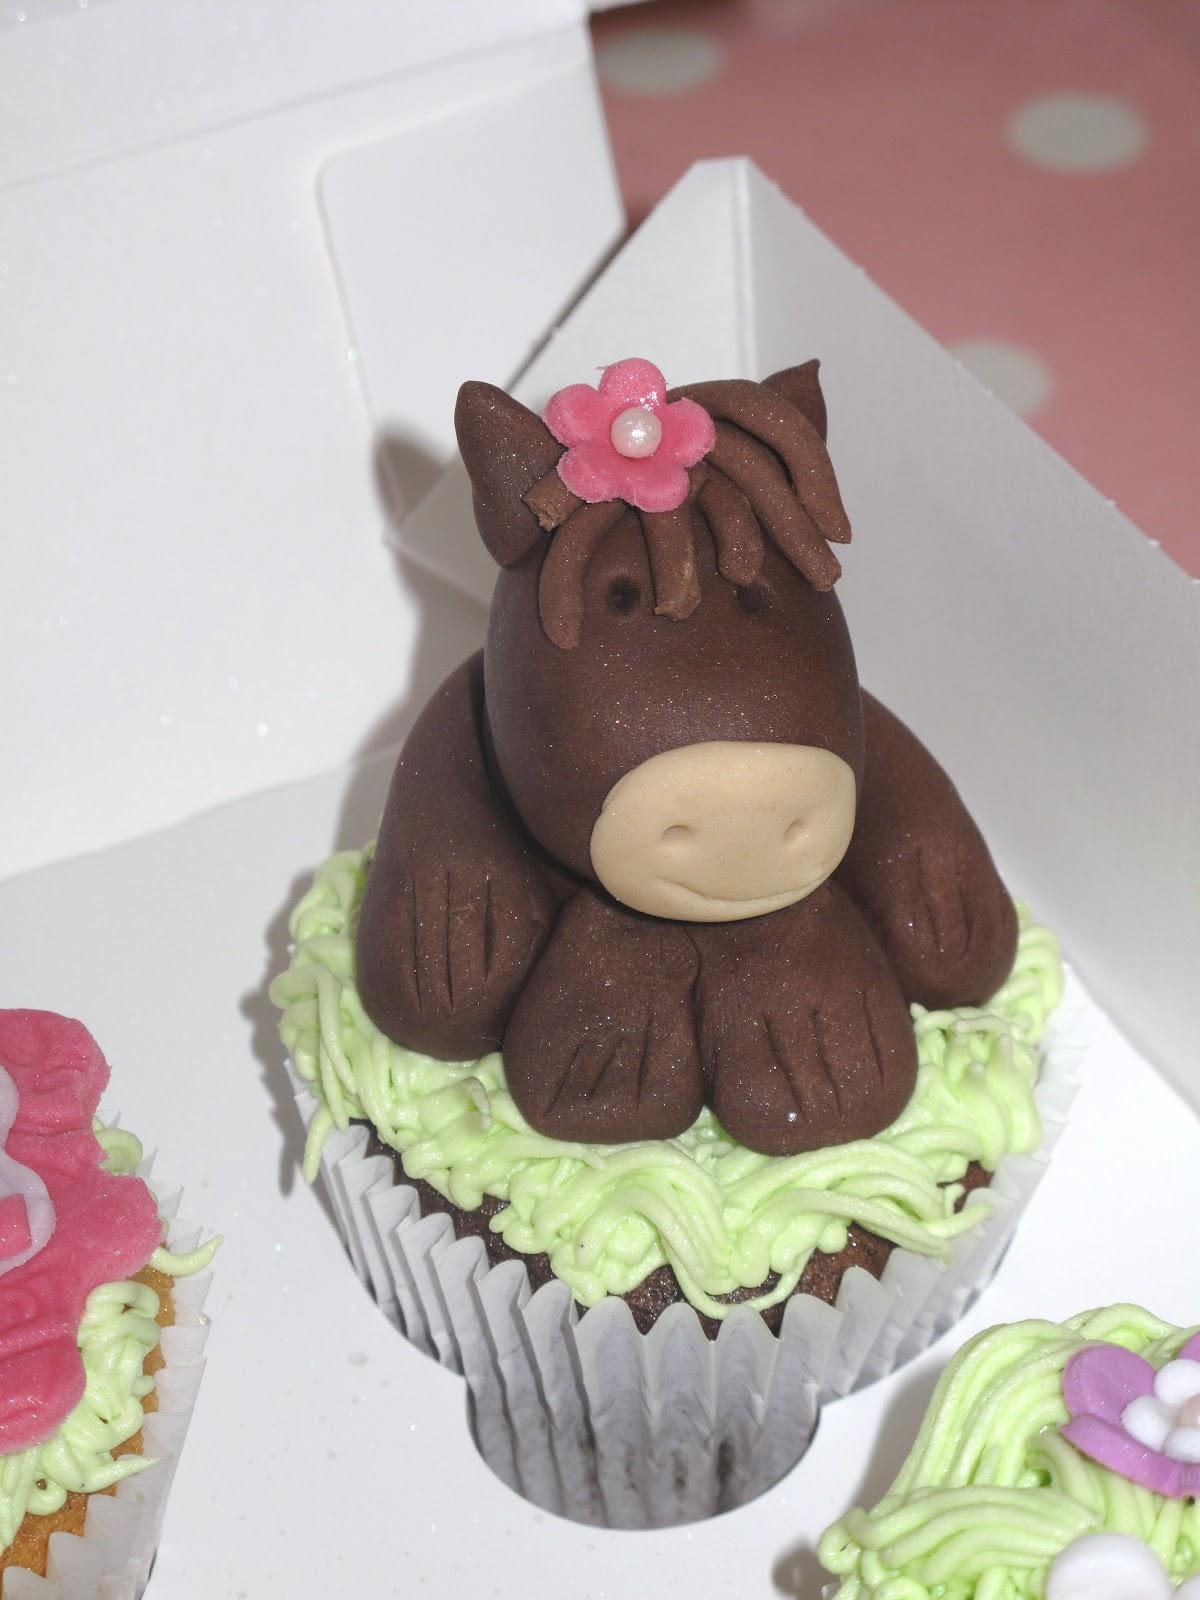 Horse Themed Birthday Cupcakes